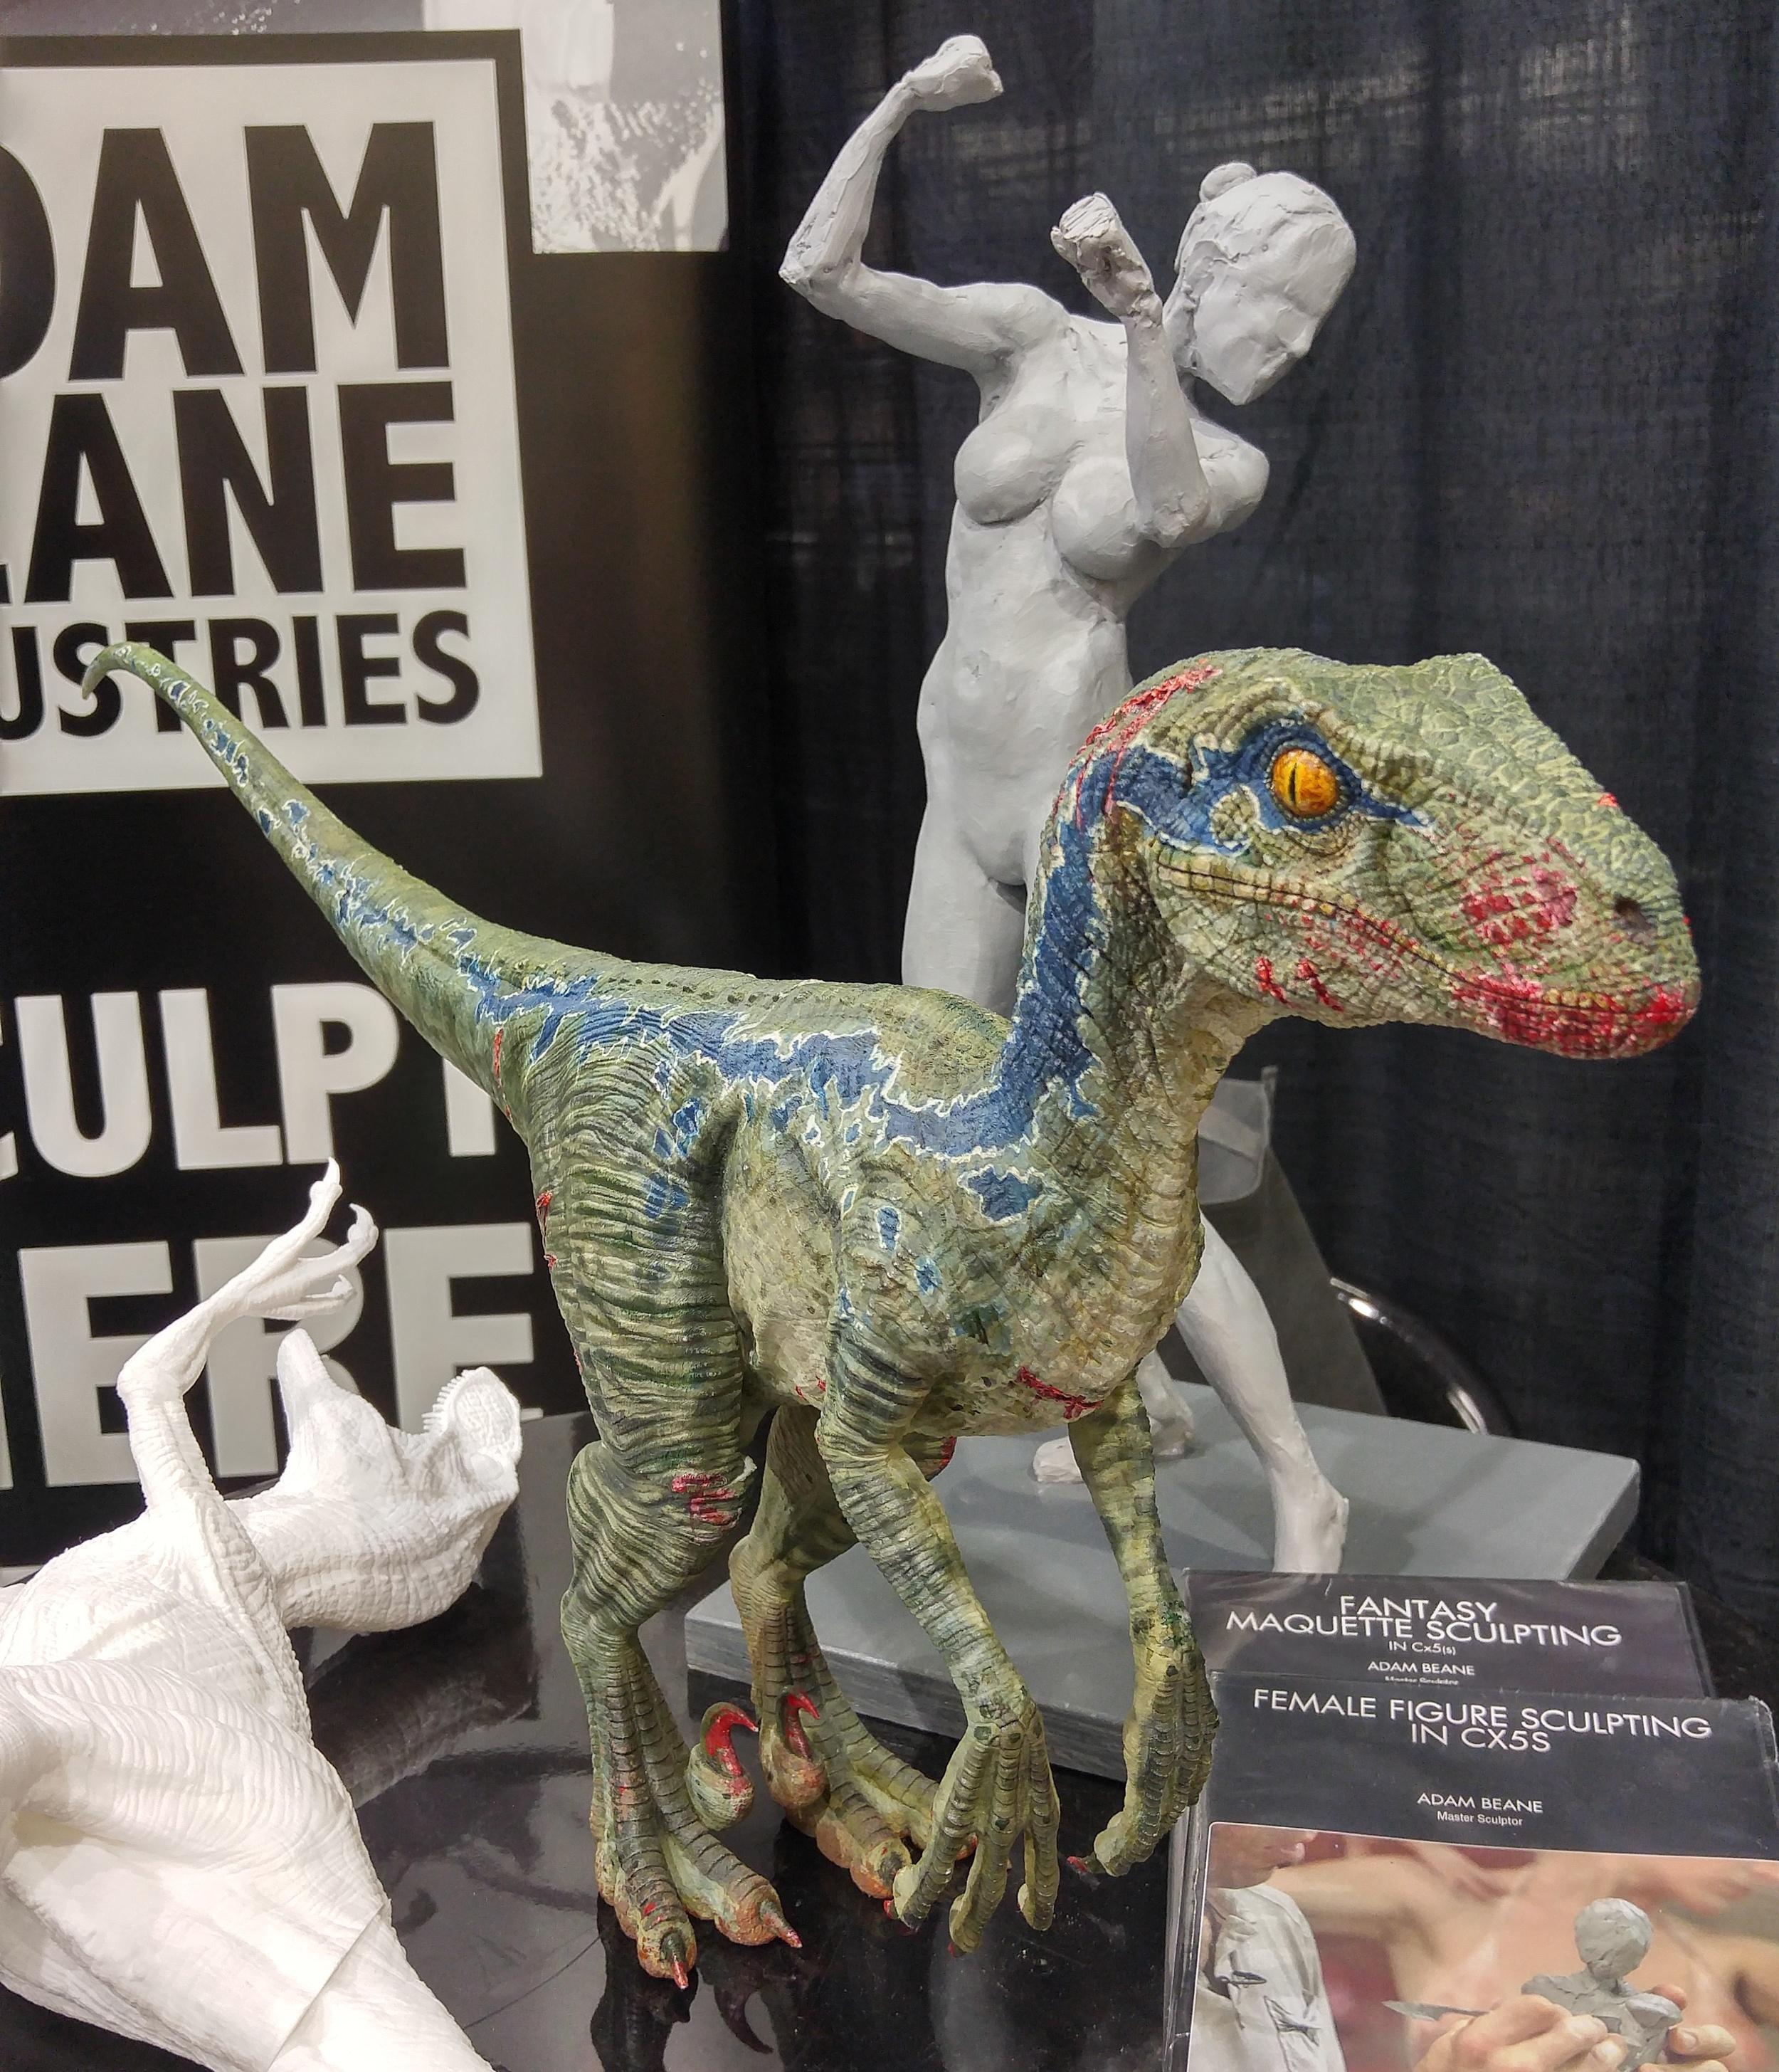 Daniel De León's amazing Jurassic Park dinosaur